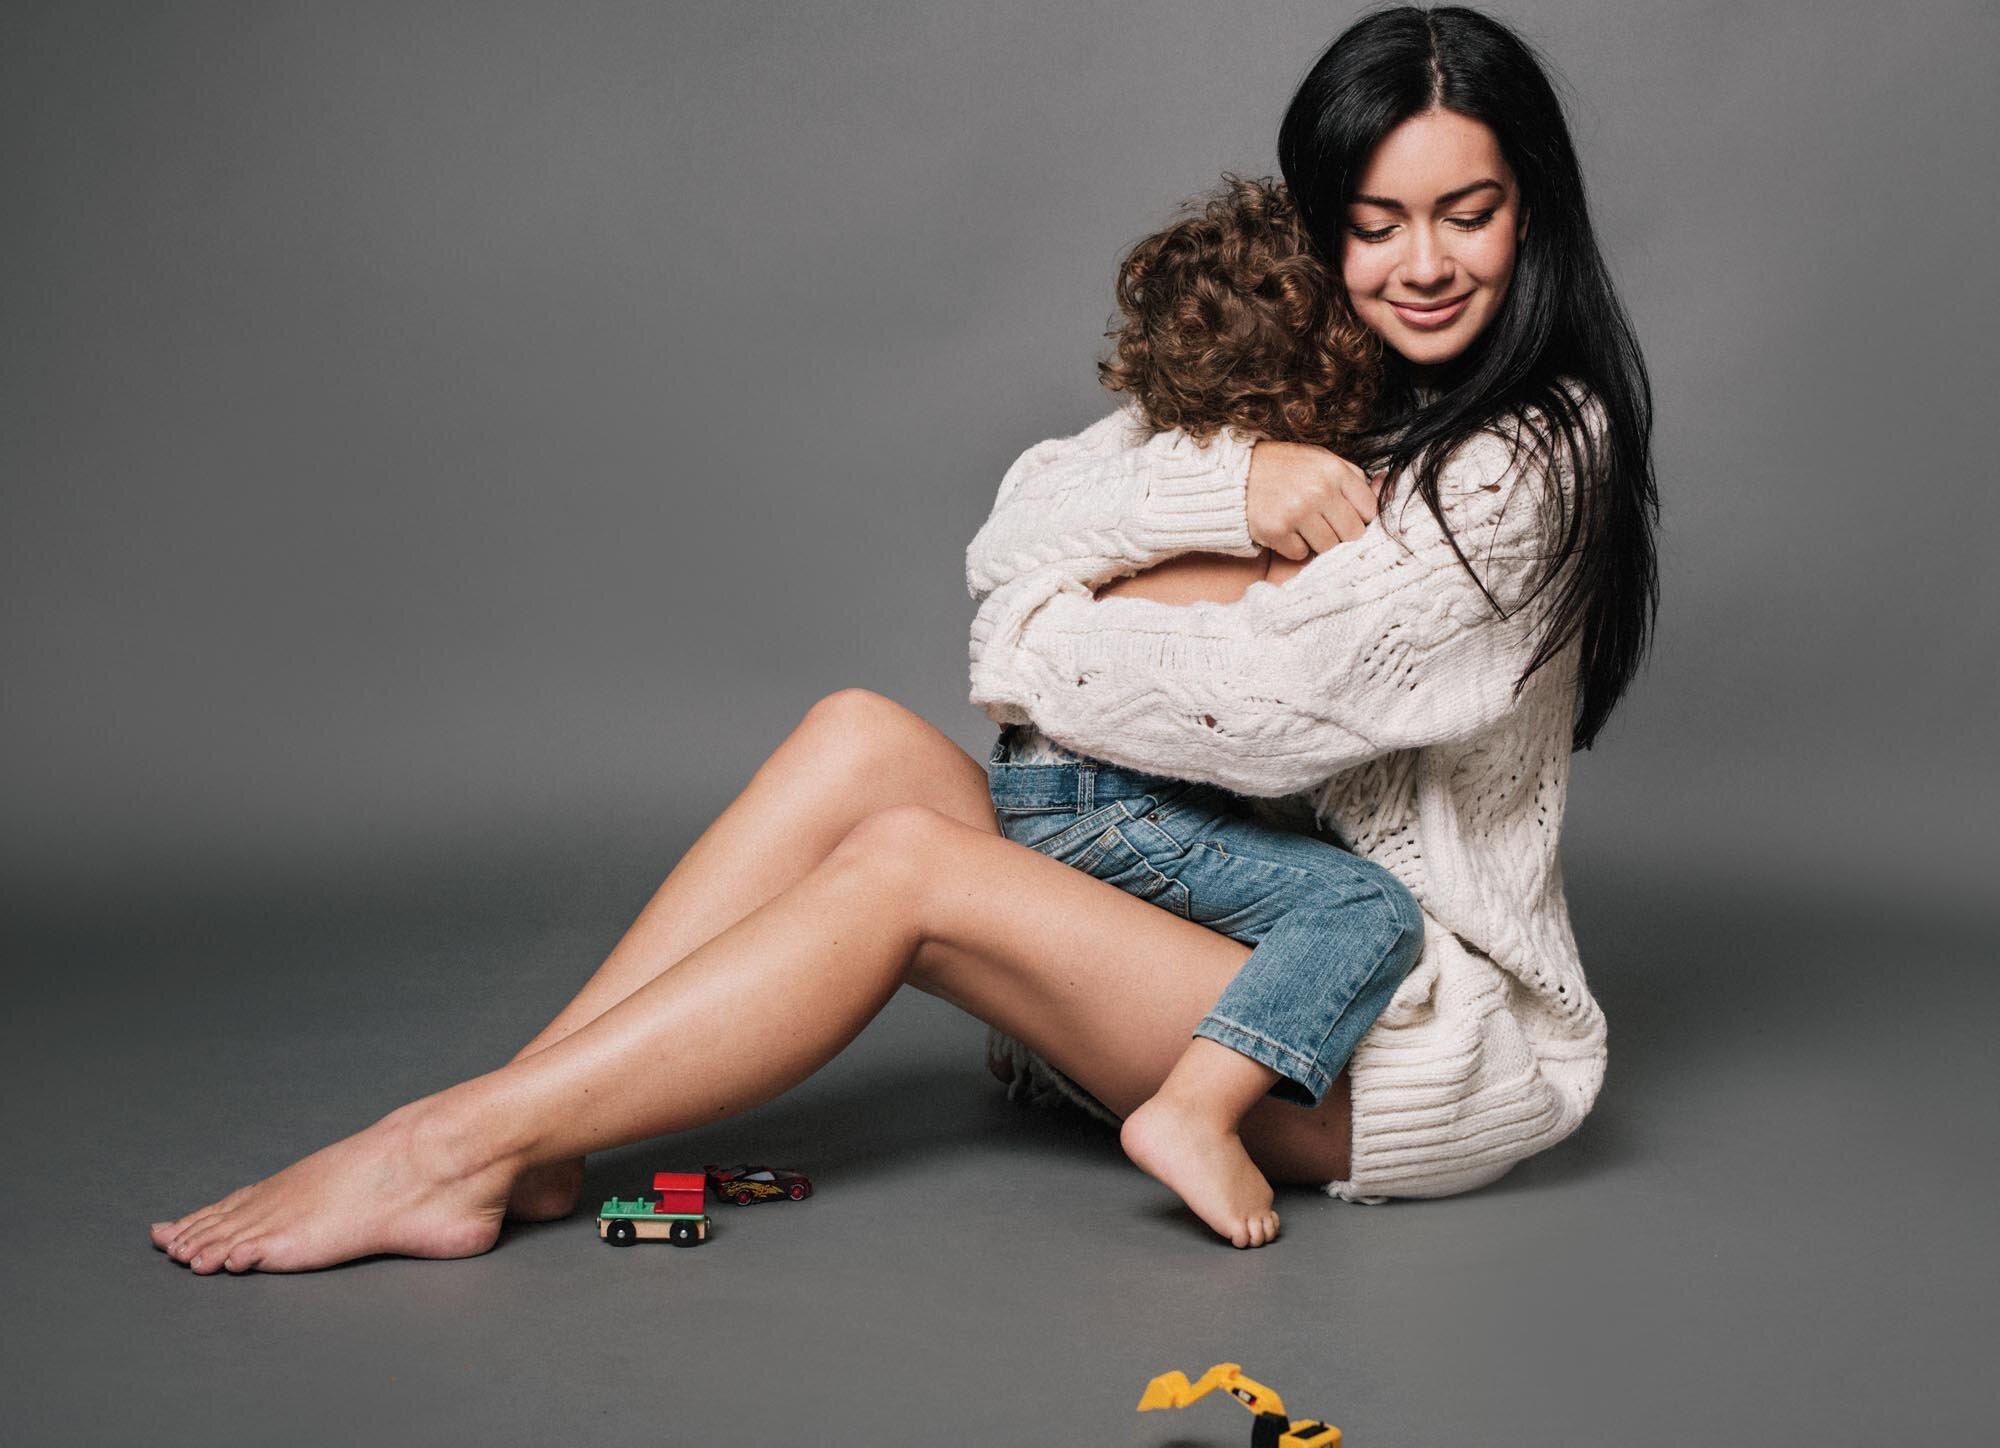 nyc-photographers-family-photographer-10008.jpg